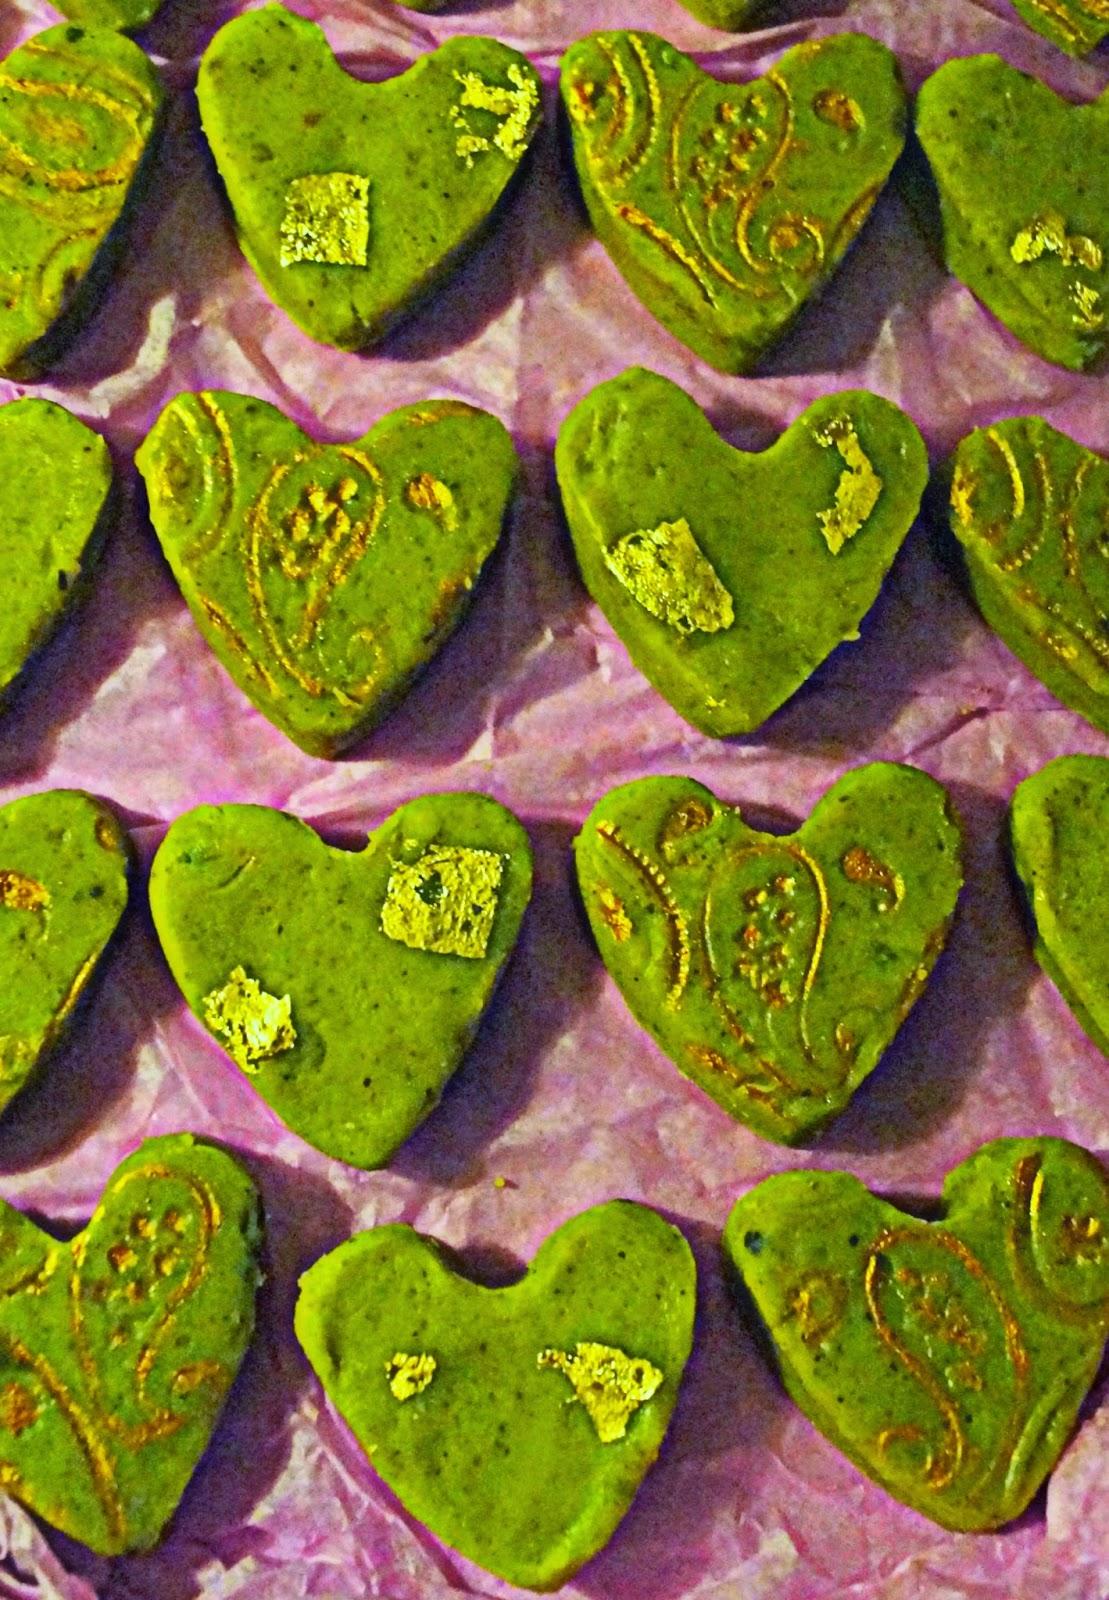 http://cupcakeluvs.blogspot.dk/2015/01/pista-barfi-pistacie-barfi-pistacio.html